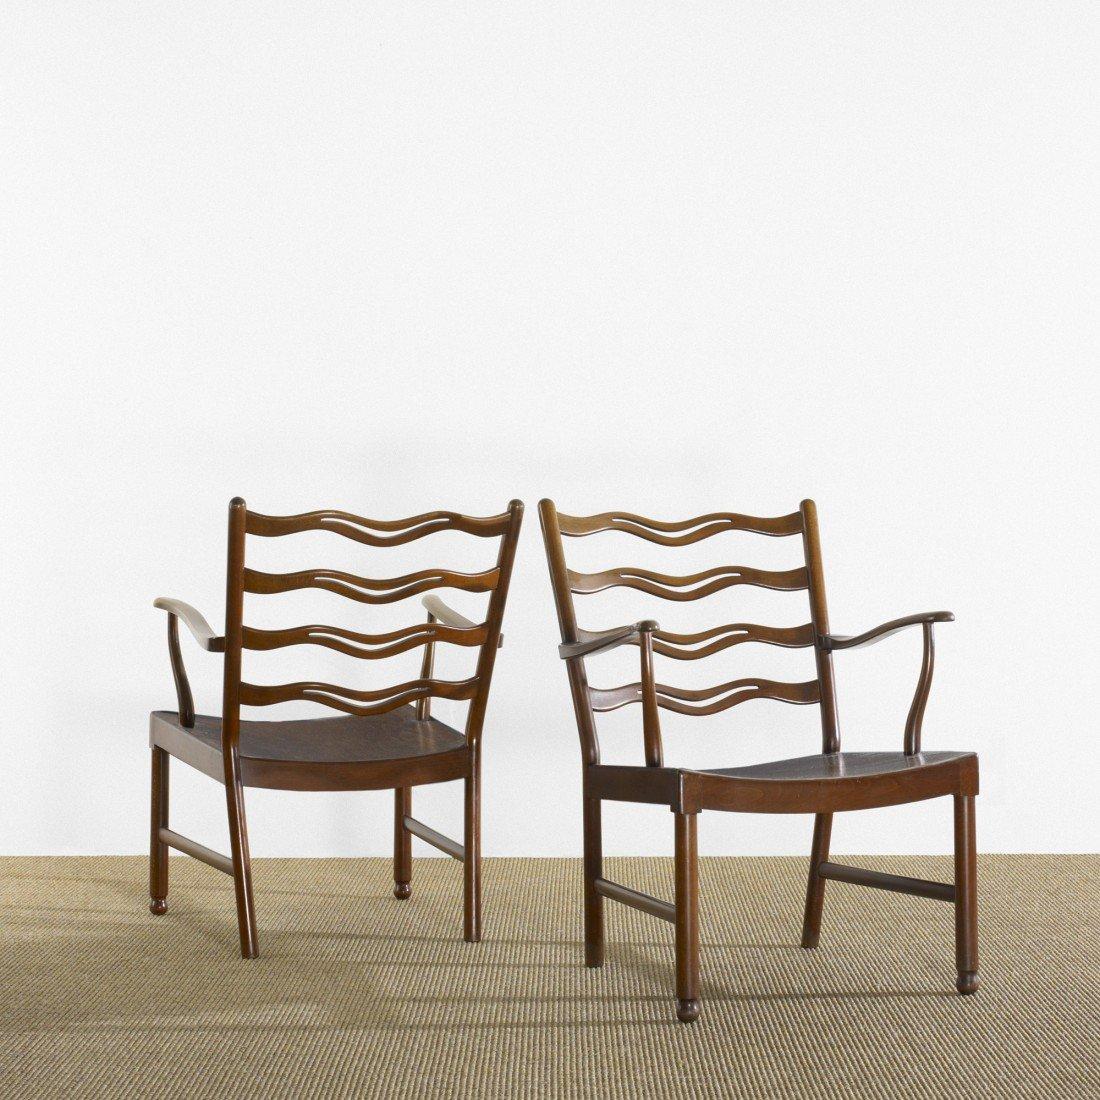 101: Ole Wanscher armchairs, pair